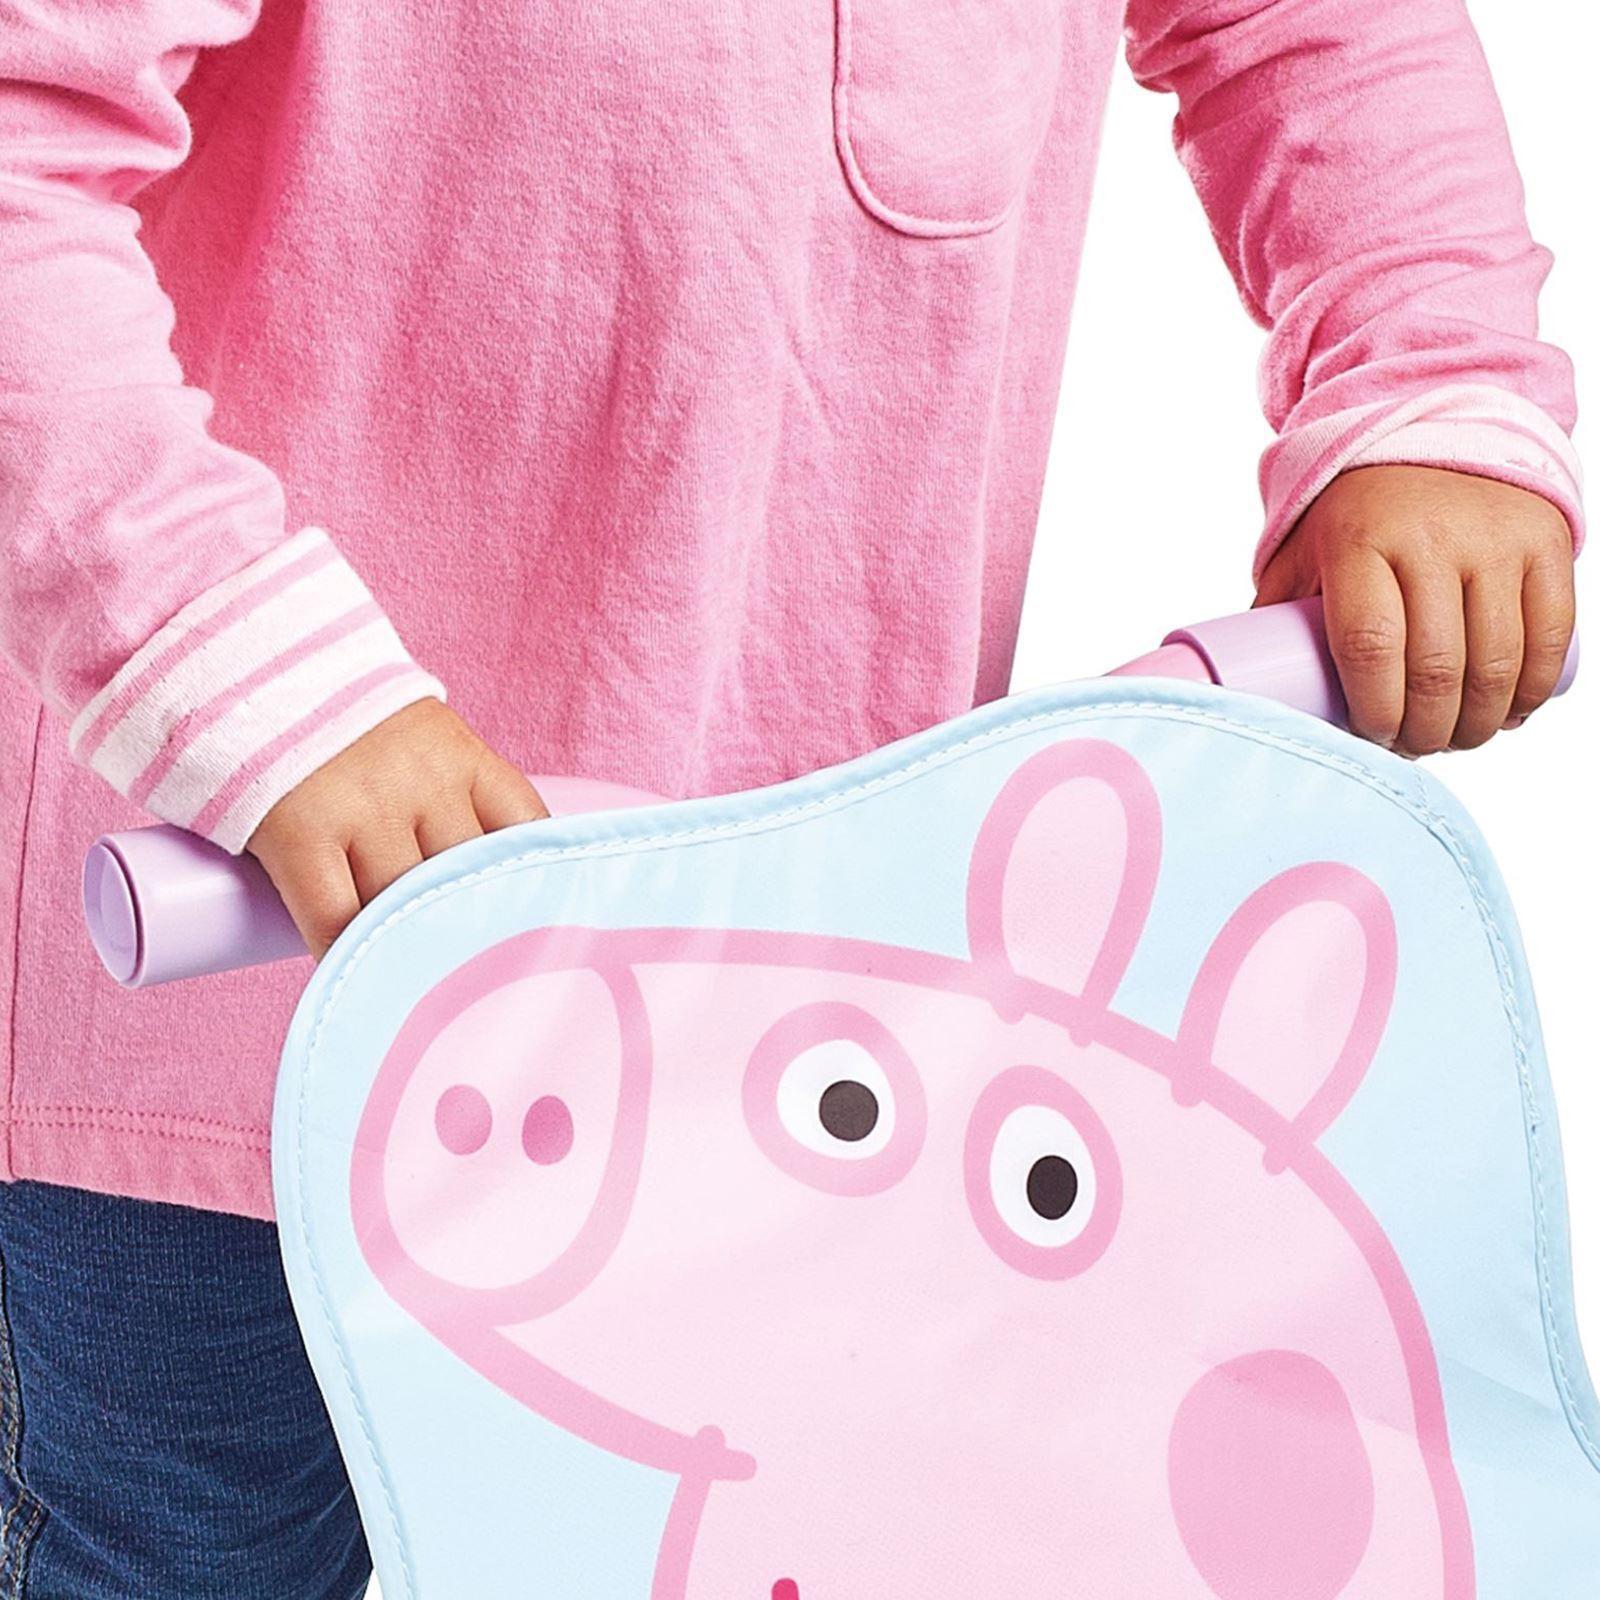 Officel Peppa Pig Enfant Junior Trampoline Enfants 12 Mois + Gratuit + P